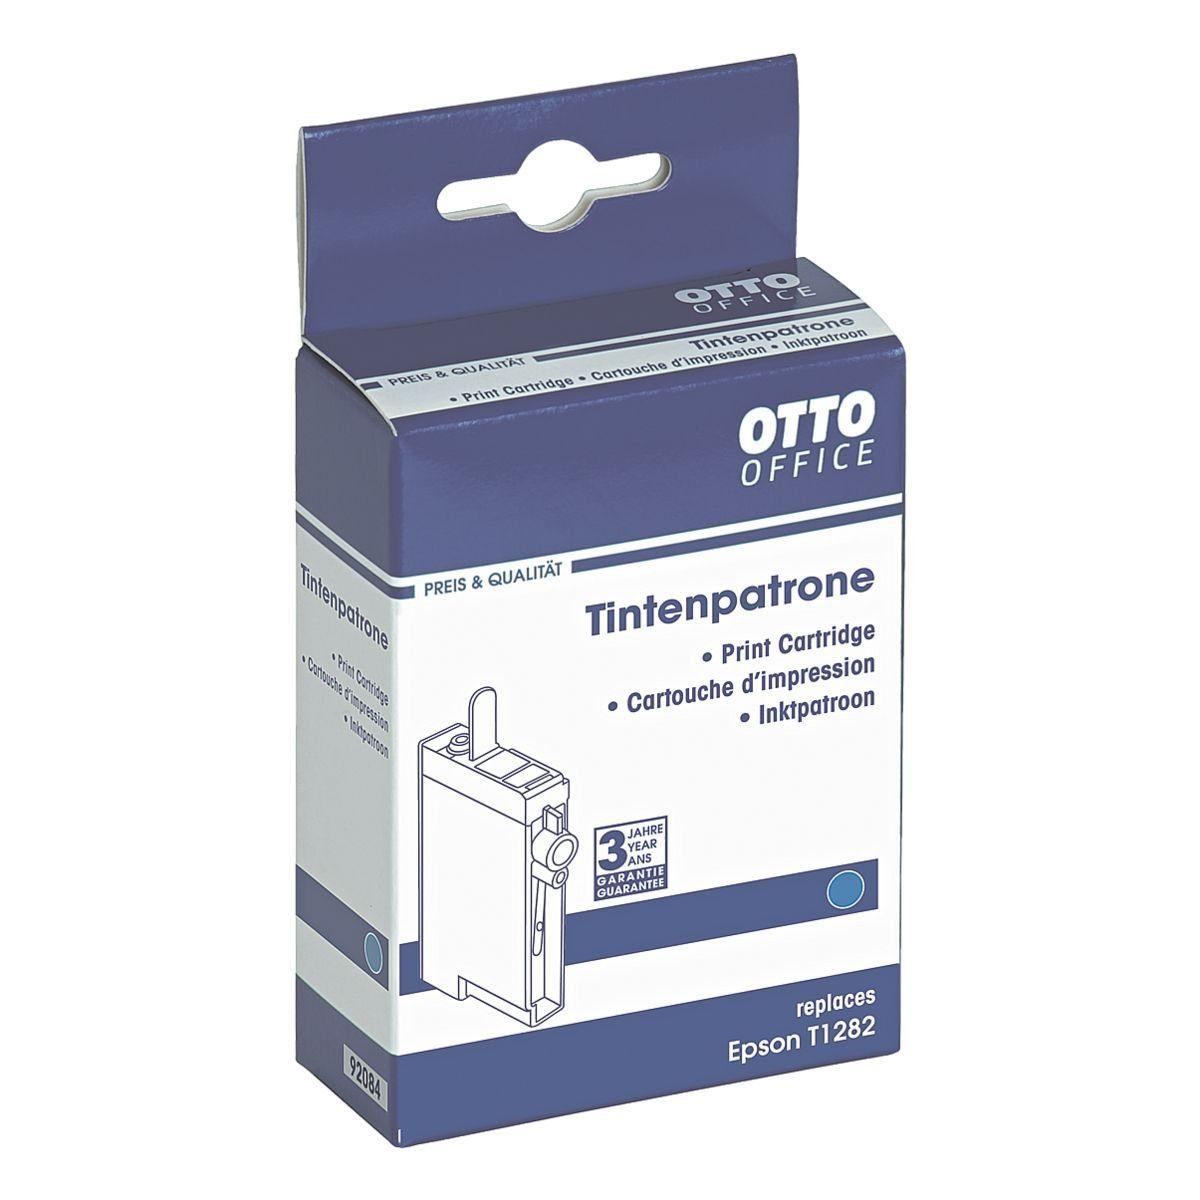 OTTO Office Standard Tintenpatrone ersetzt Epson »T1282«